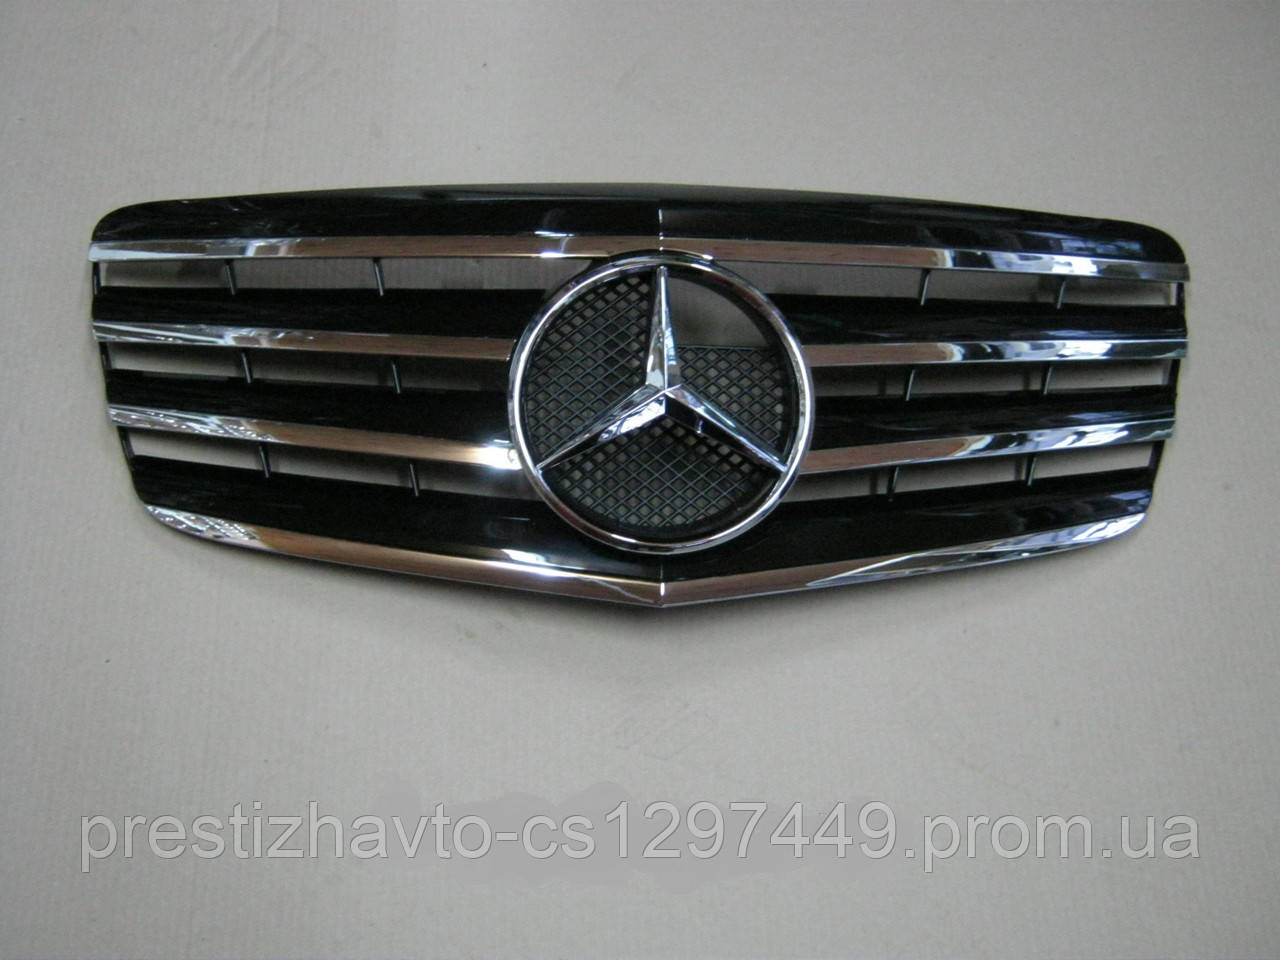 Решетка радиатора Mercedes E-Сlass W211 (2007-2009)